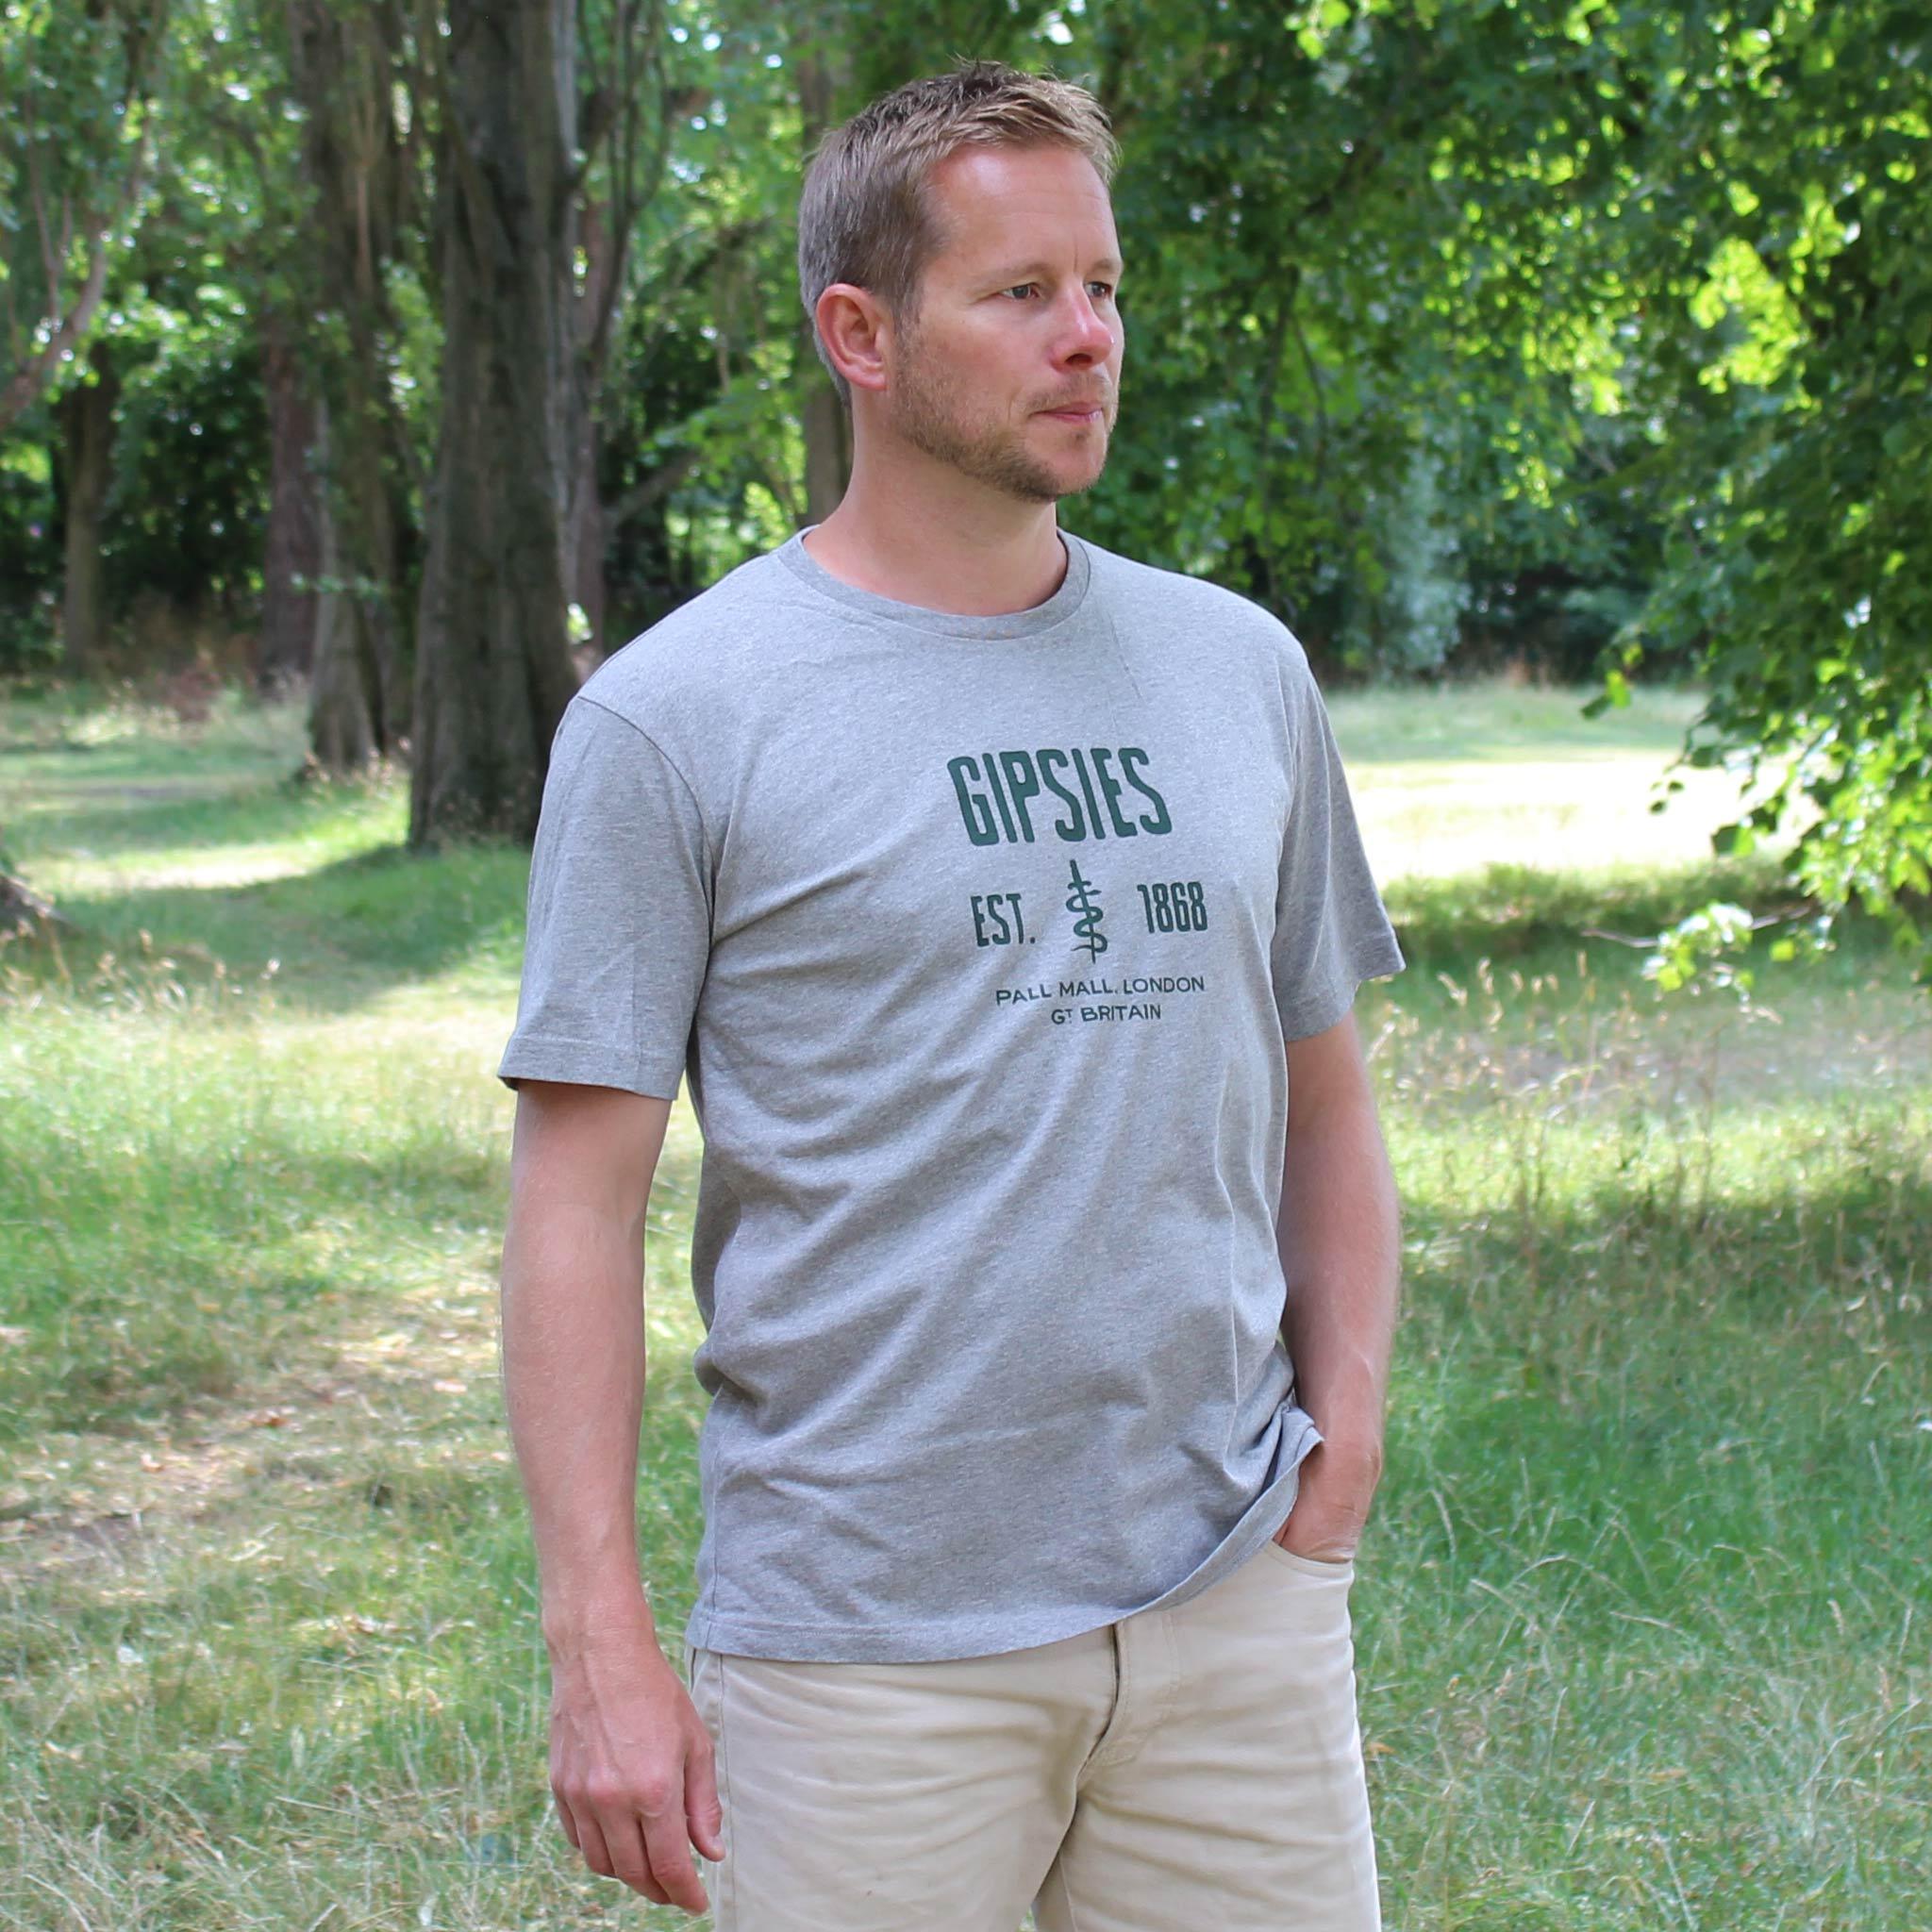 Gipsies Grey T-shirt model